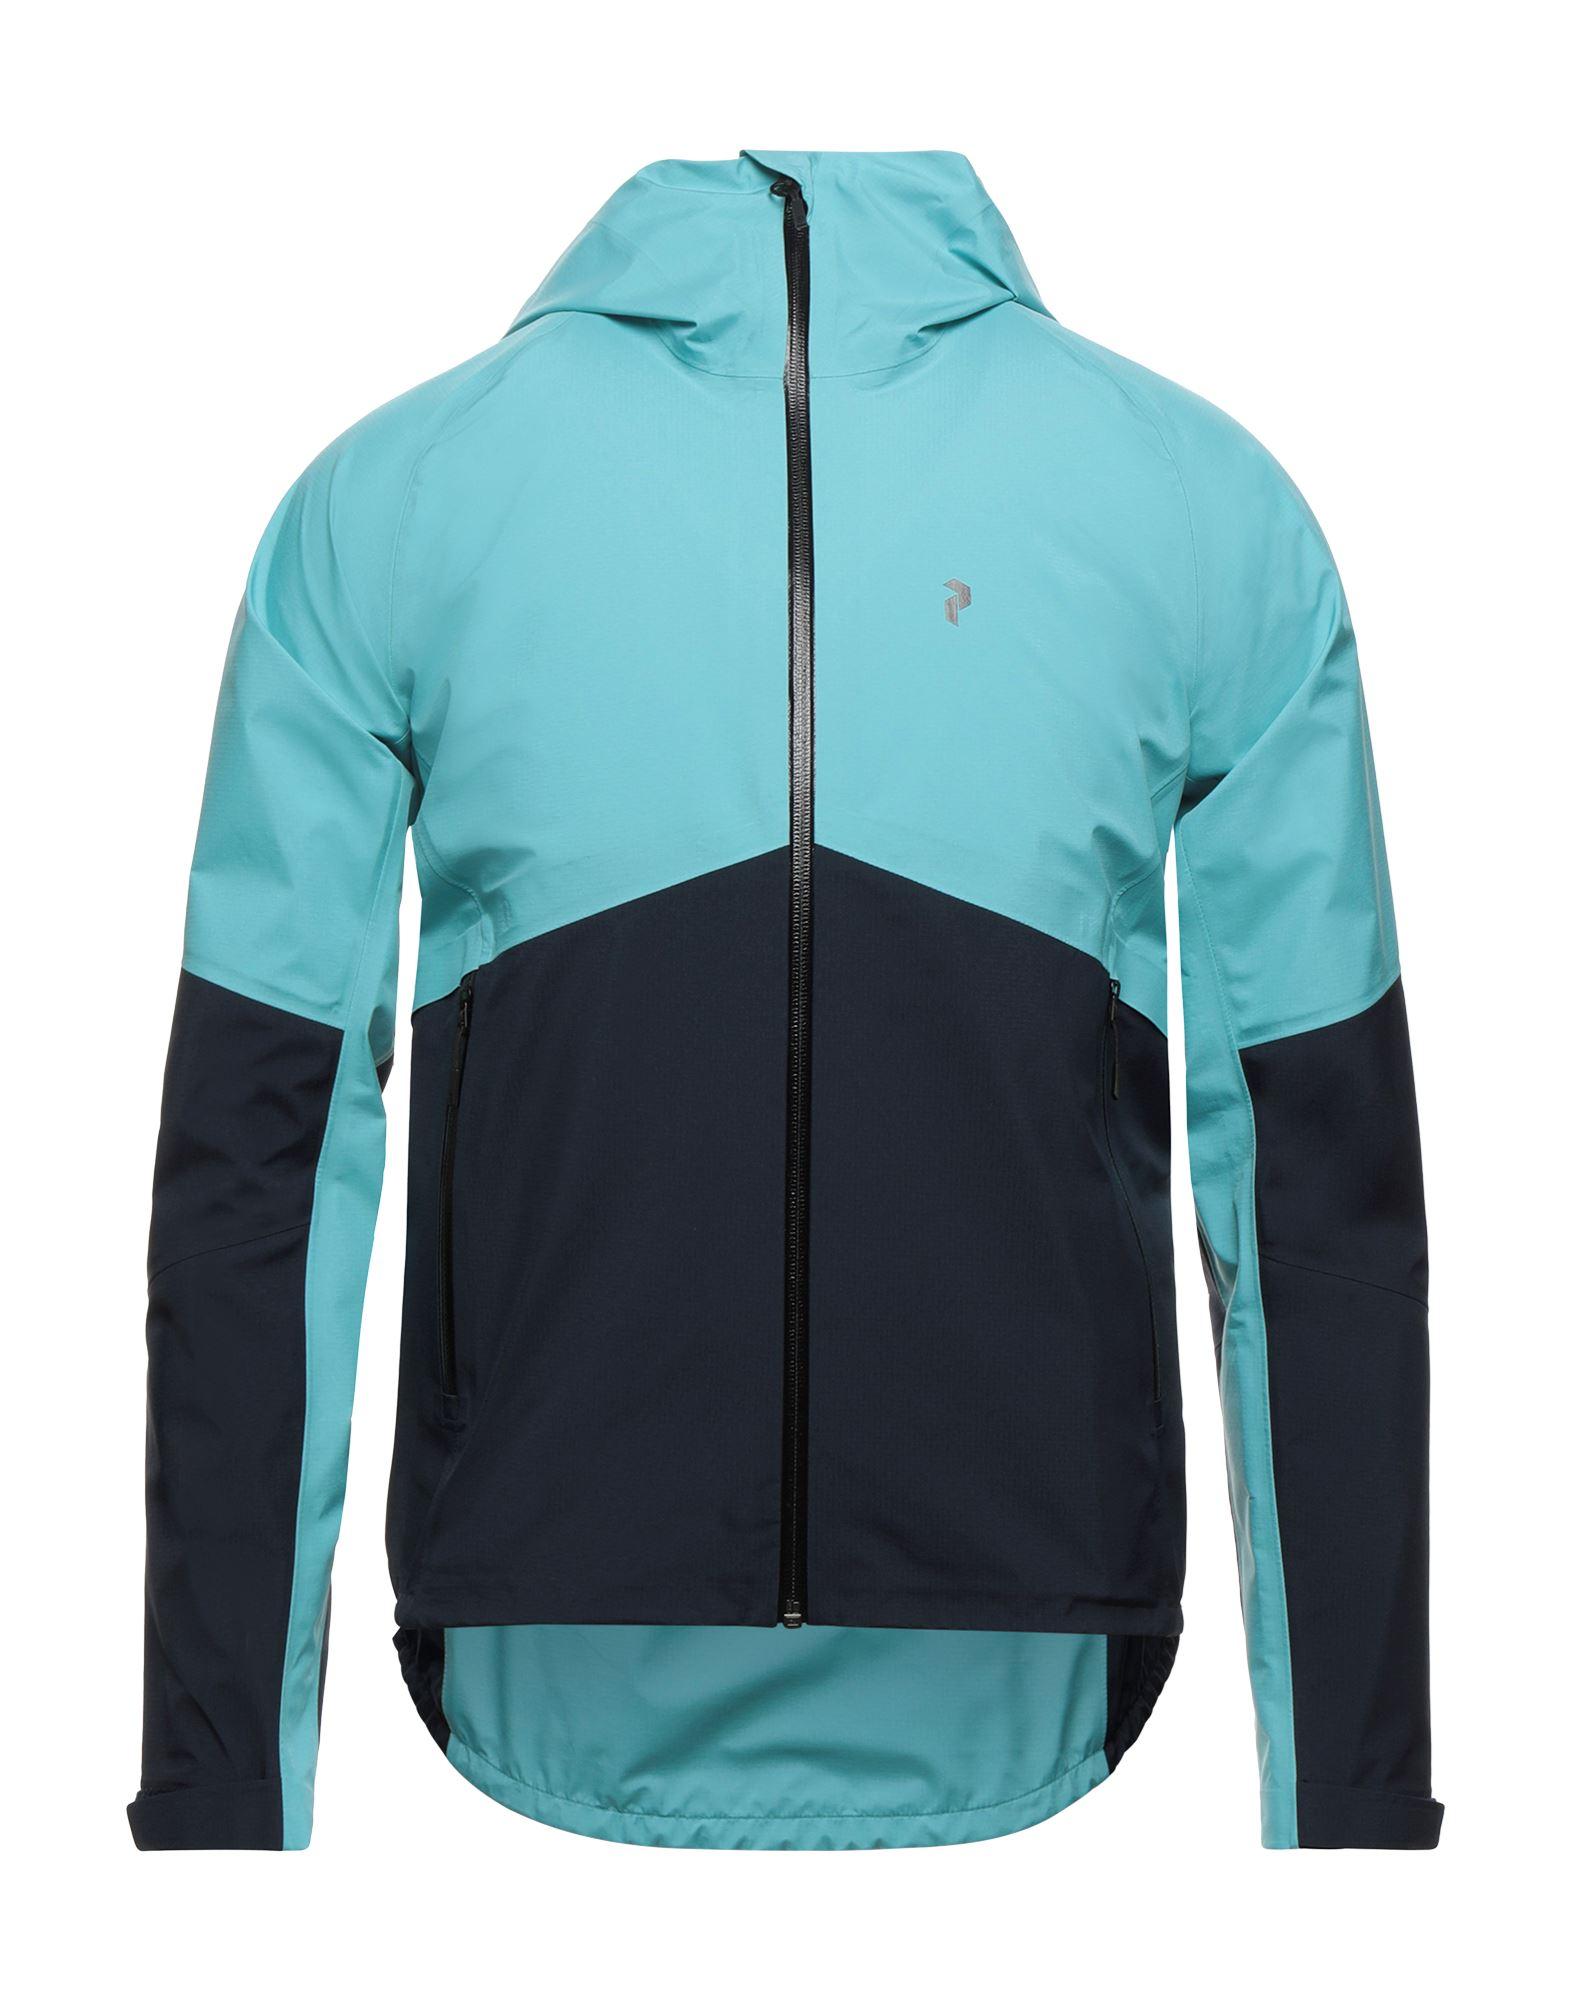 PEAK PERFORMANCE Куртка куртка мембранная мужская columbia bradley peak™ размер 46